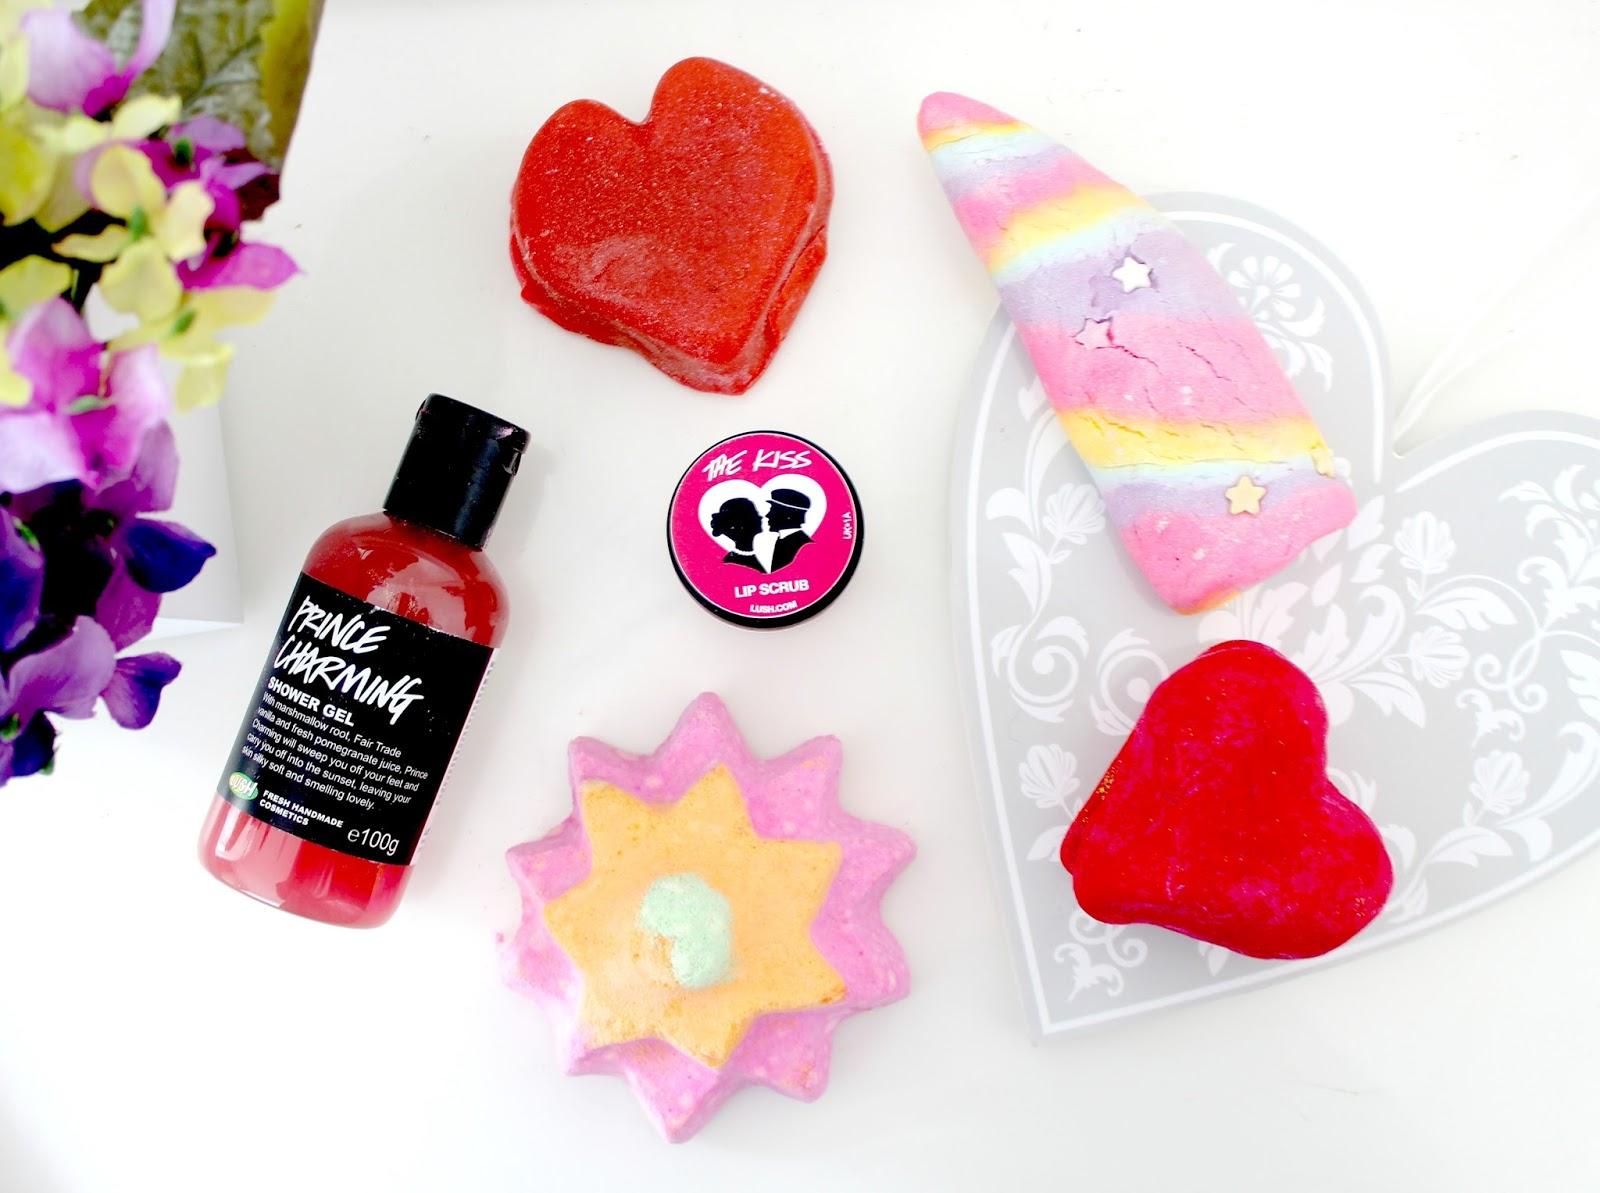 LUSH Valentines Day Collection, LUSH Bath Products, LUSH Limited Edition Valentine's Collection